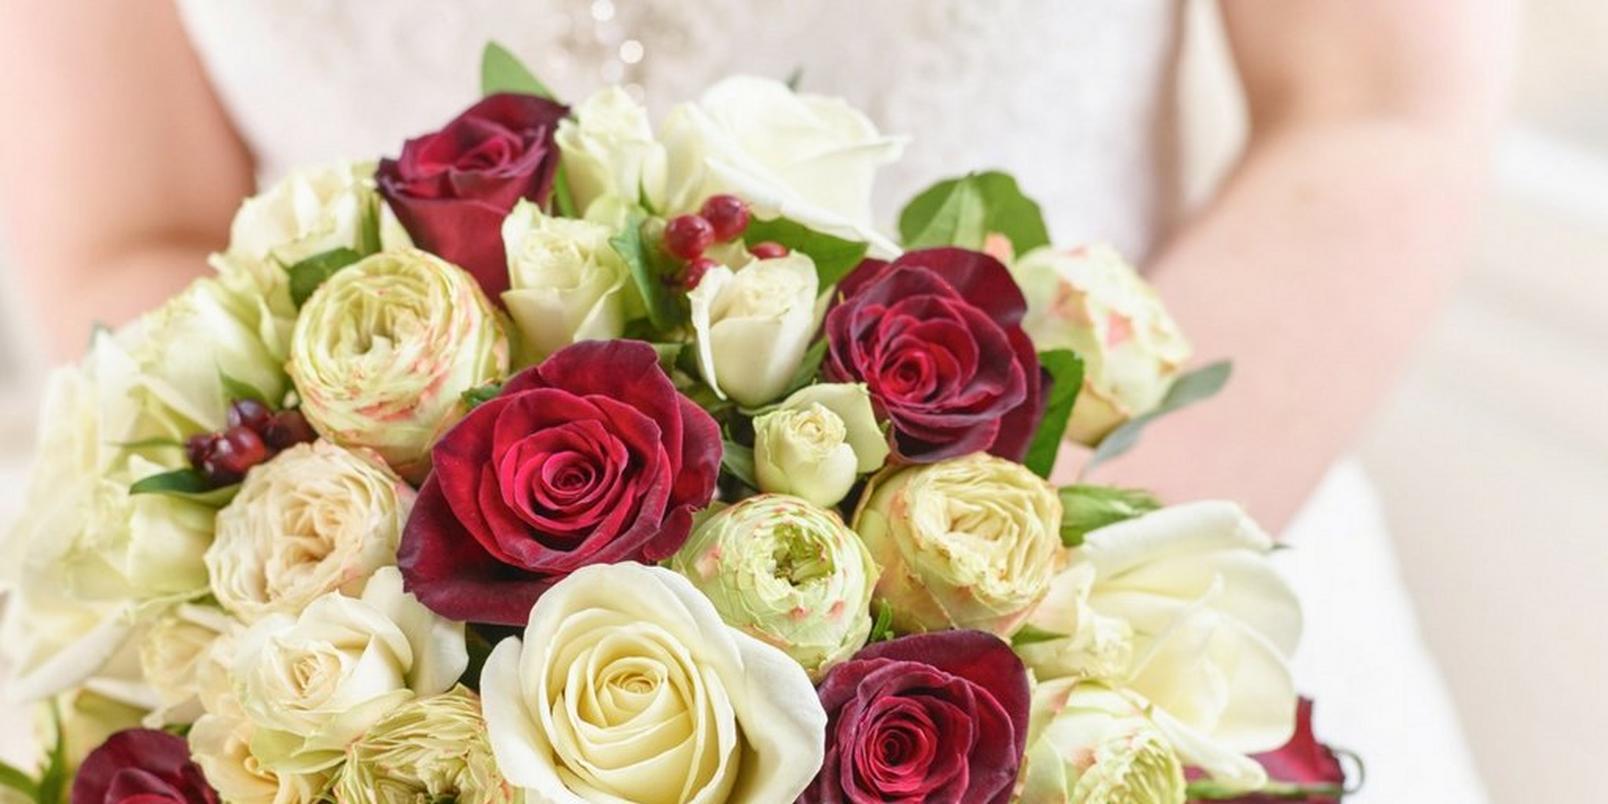 the-hidden-symbolism-in-your-wedding-bouquet-2